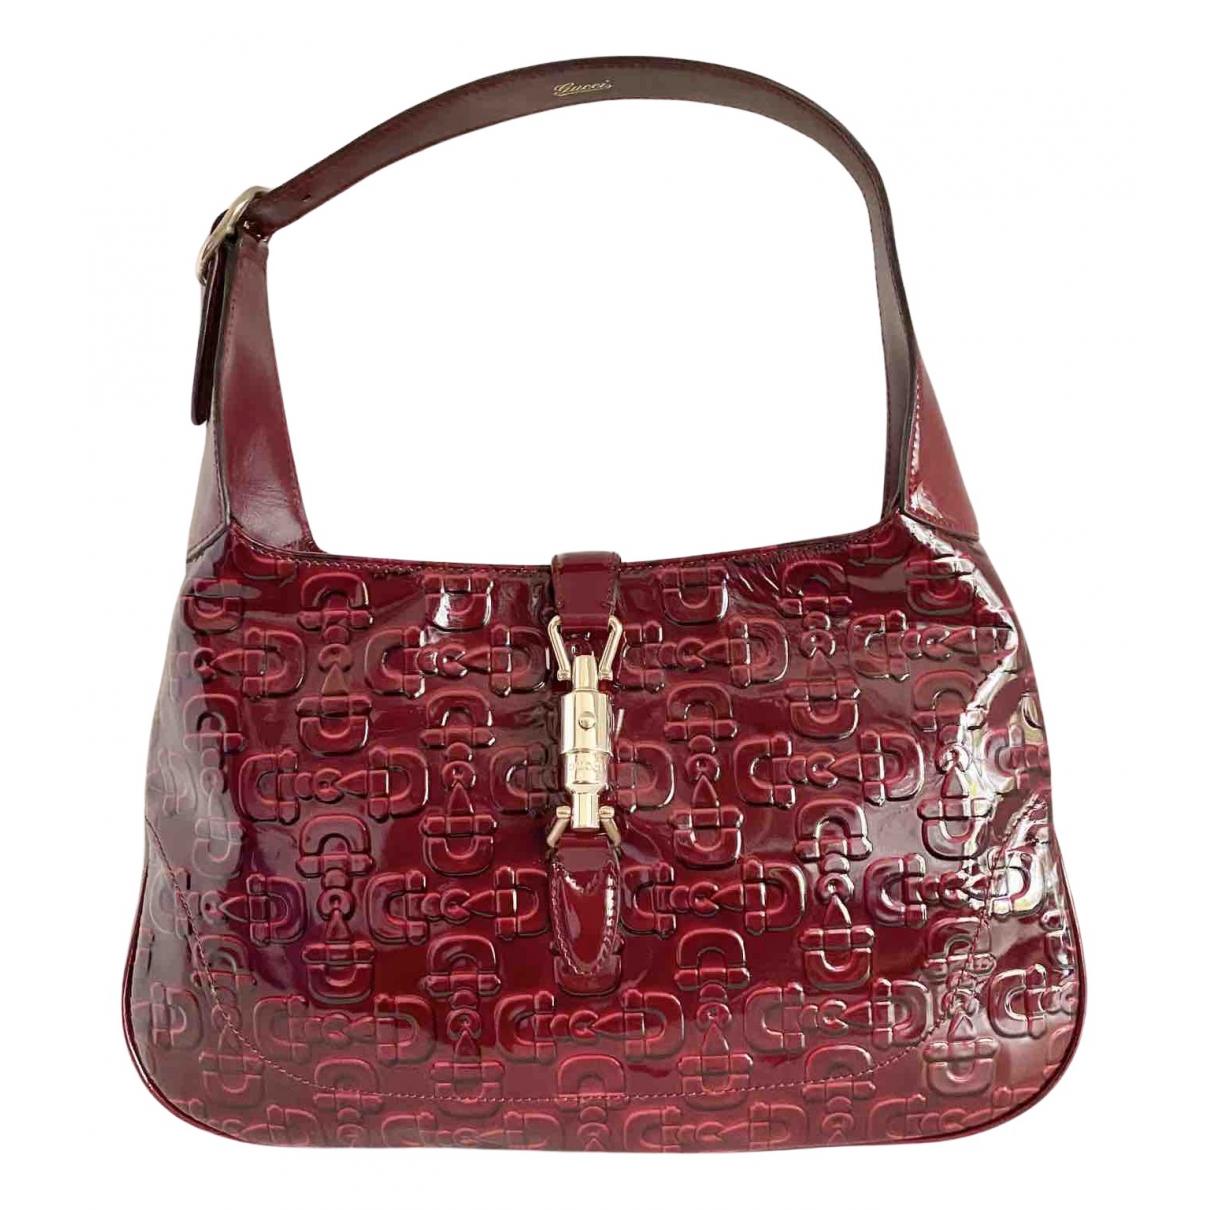 Gucci Jackie Burgundy Patent leather handbag for Women N